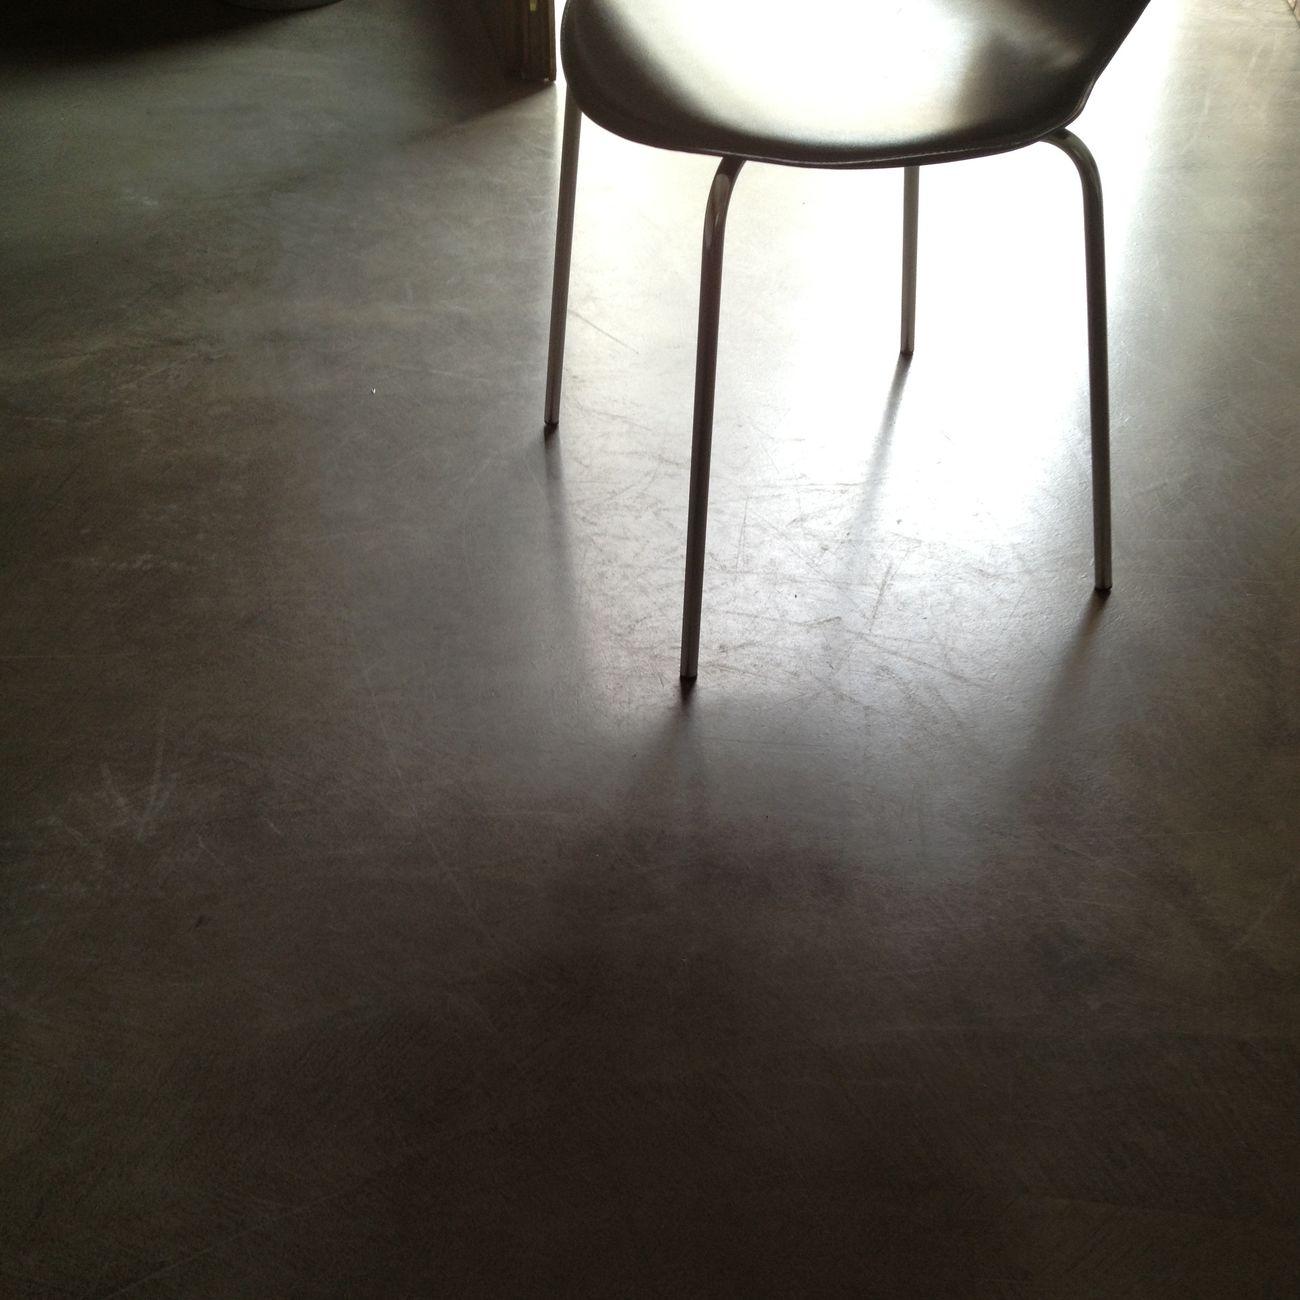 Chair Indoors  Minimalist Sepia